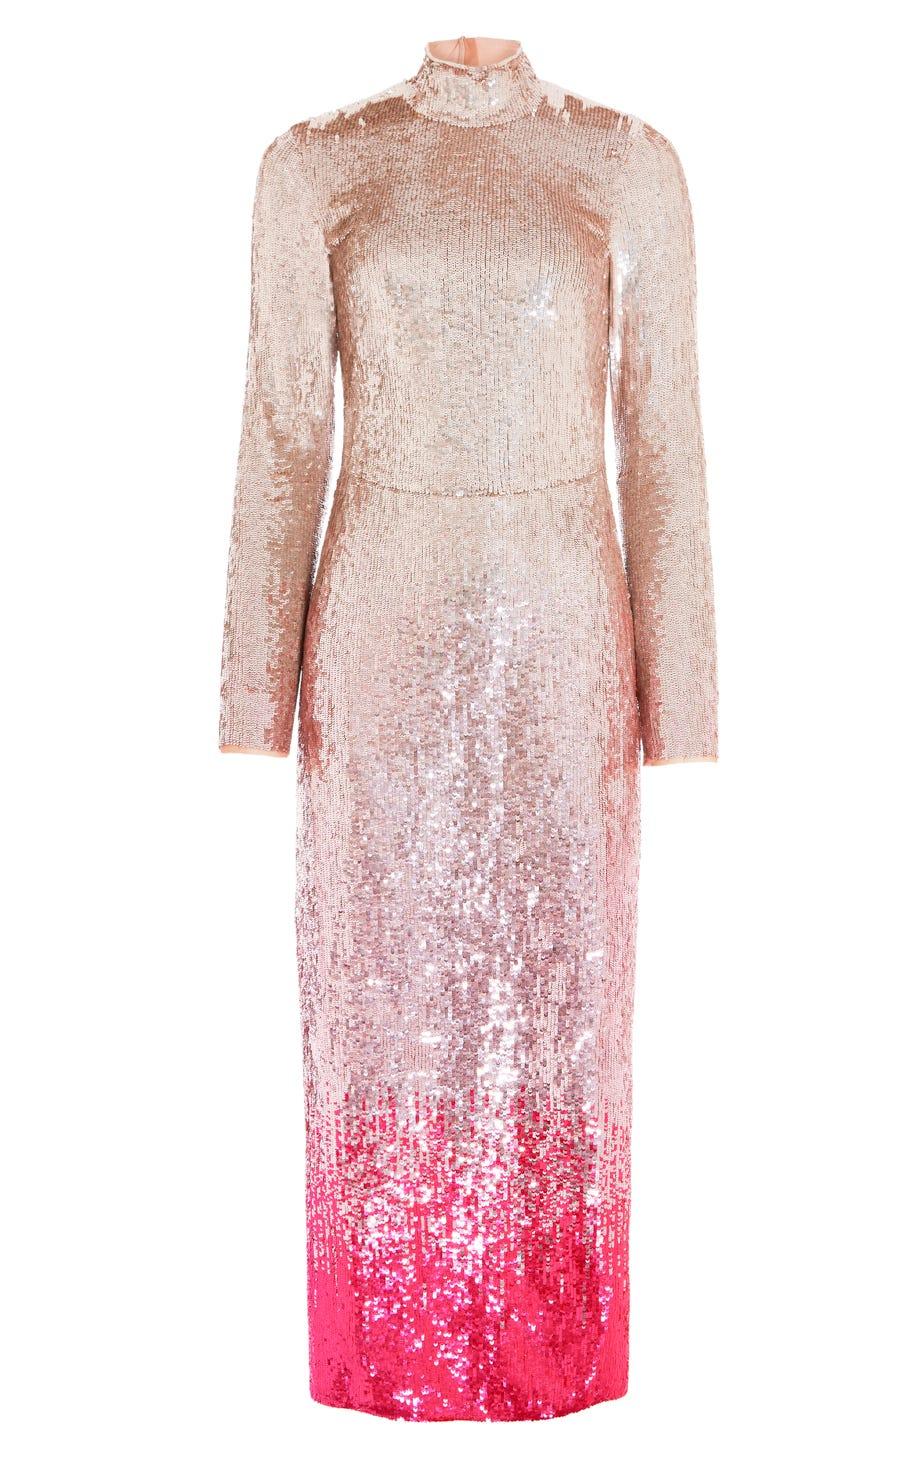 Opia Dress